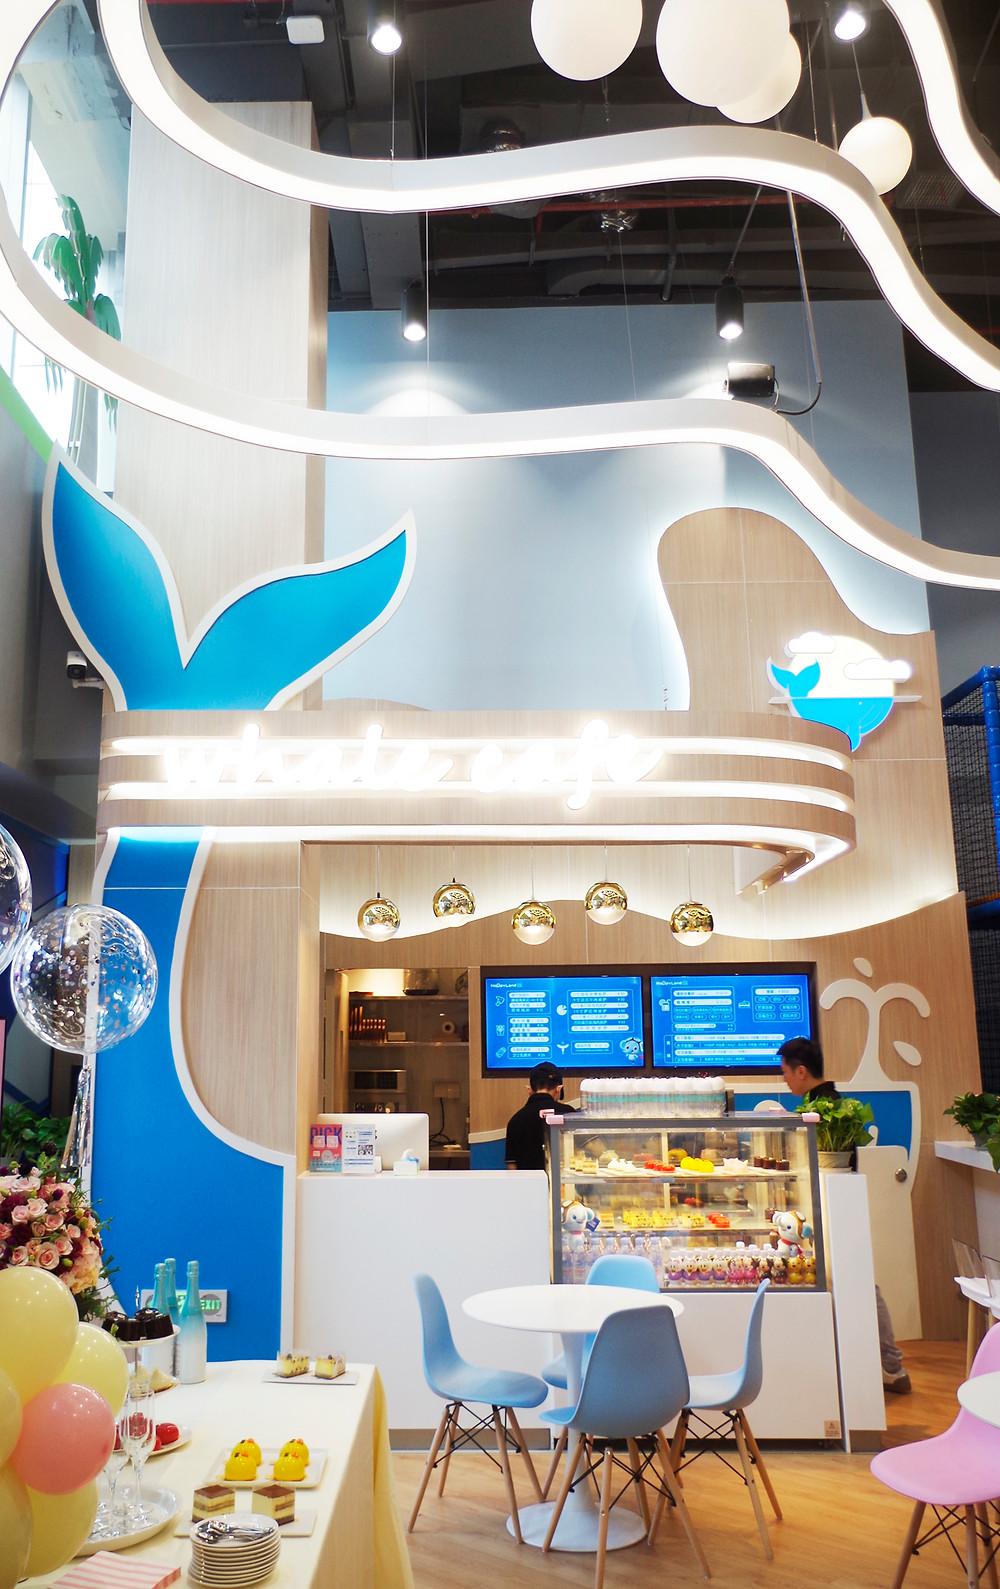 鲸鱼岛咖啡厅/The Whale Cafe